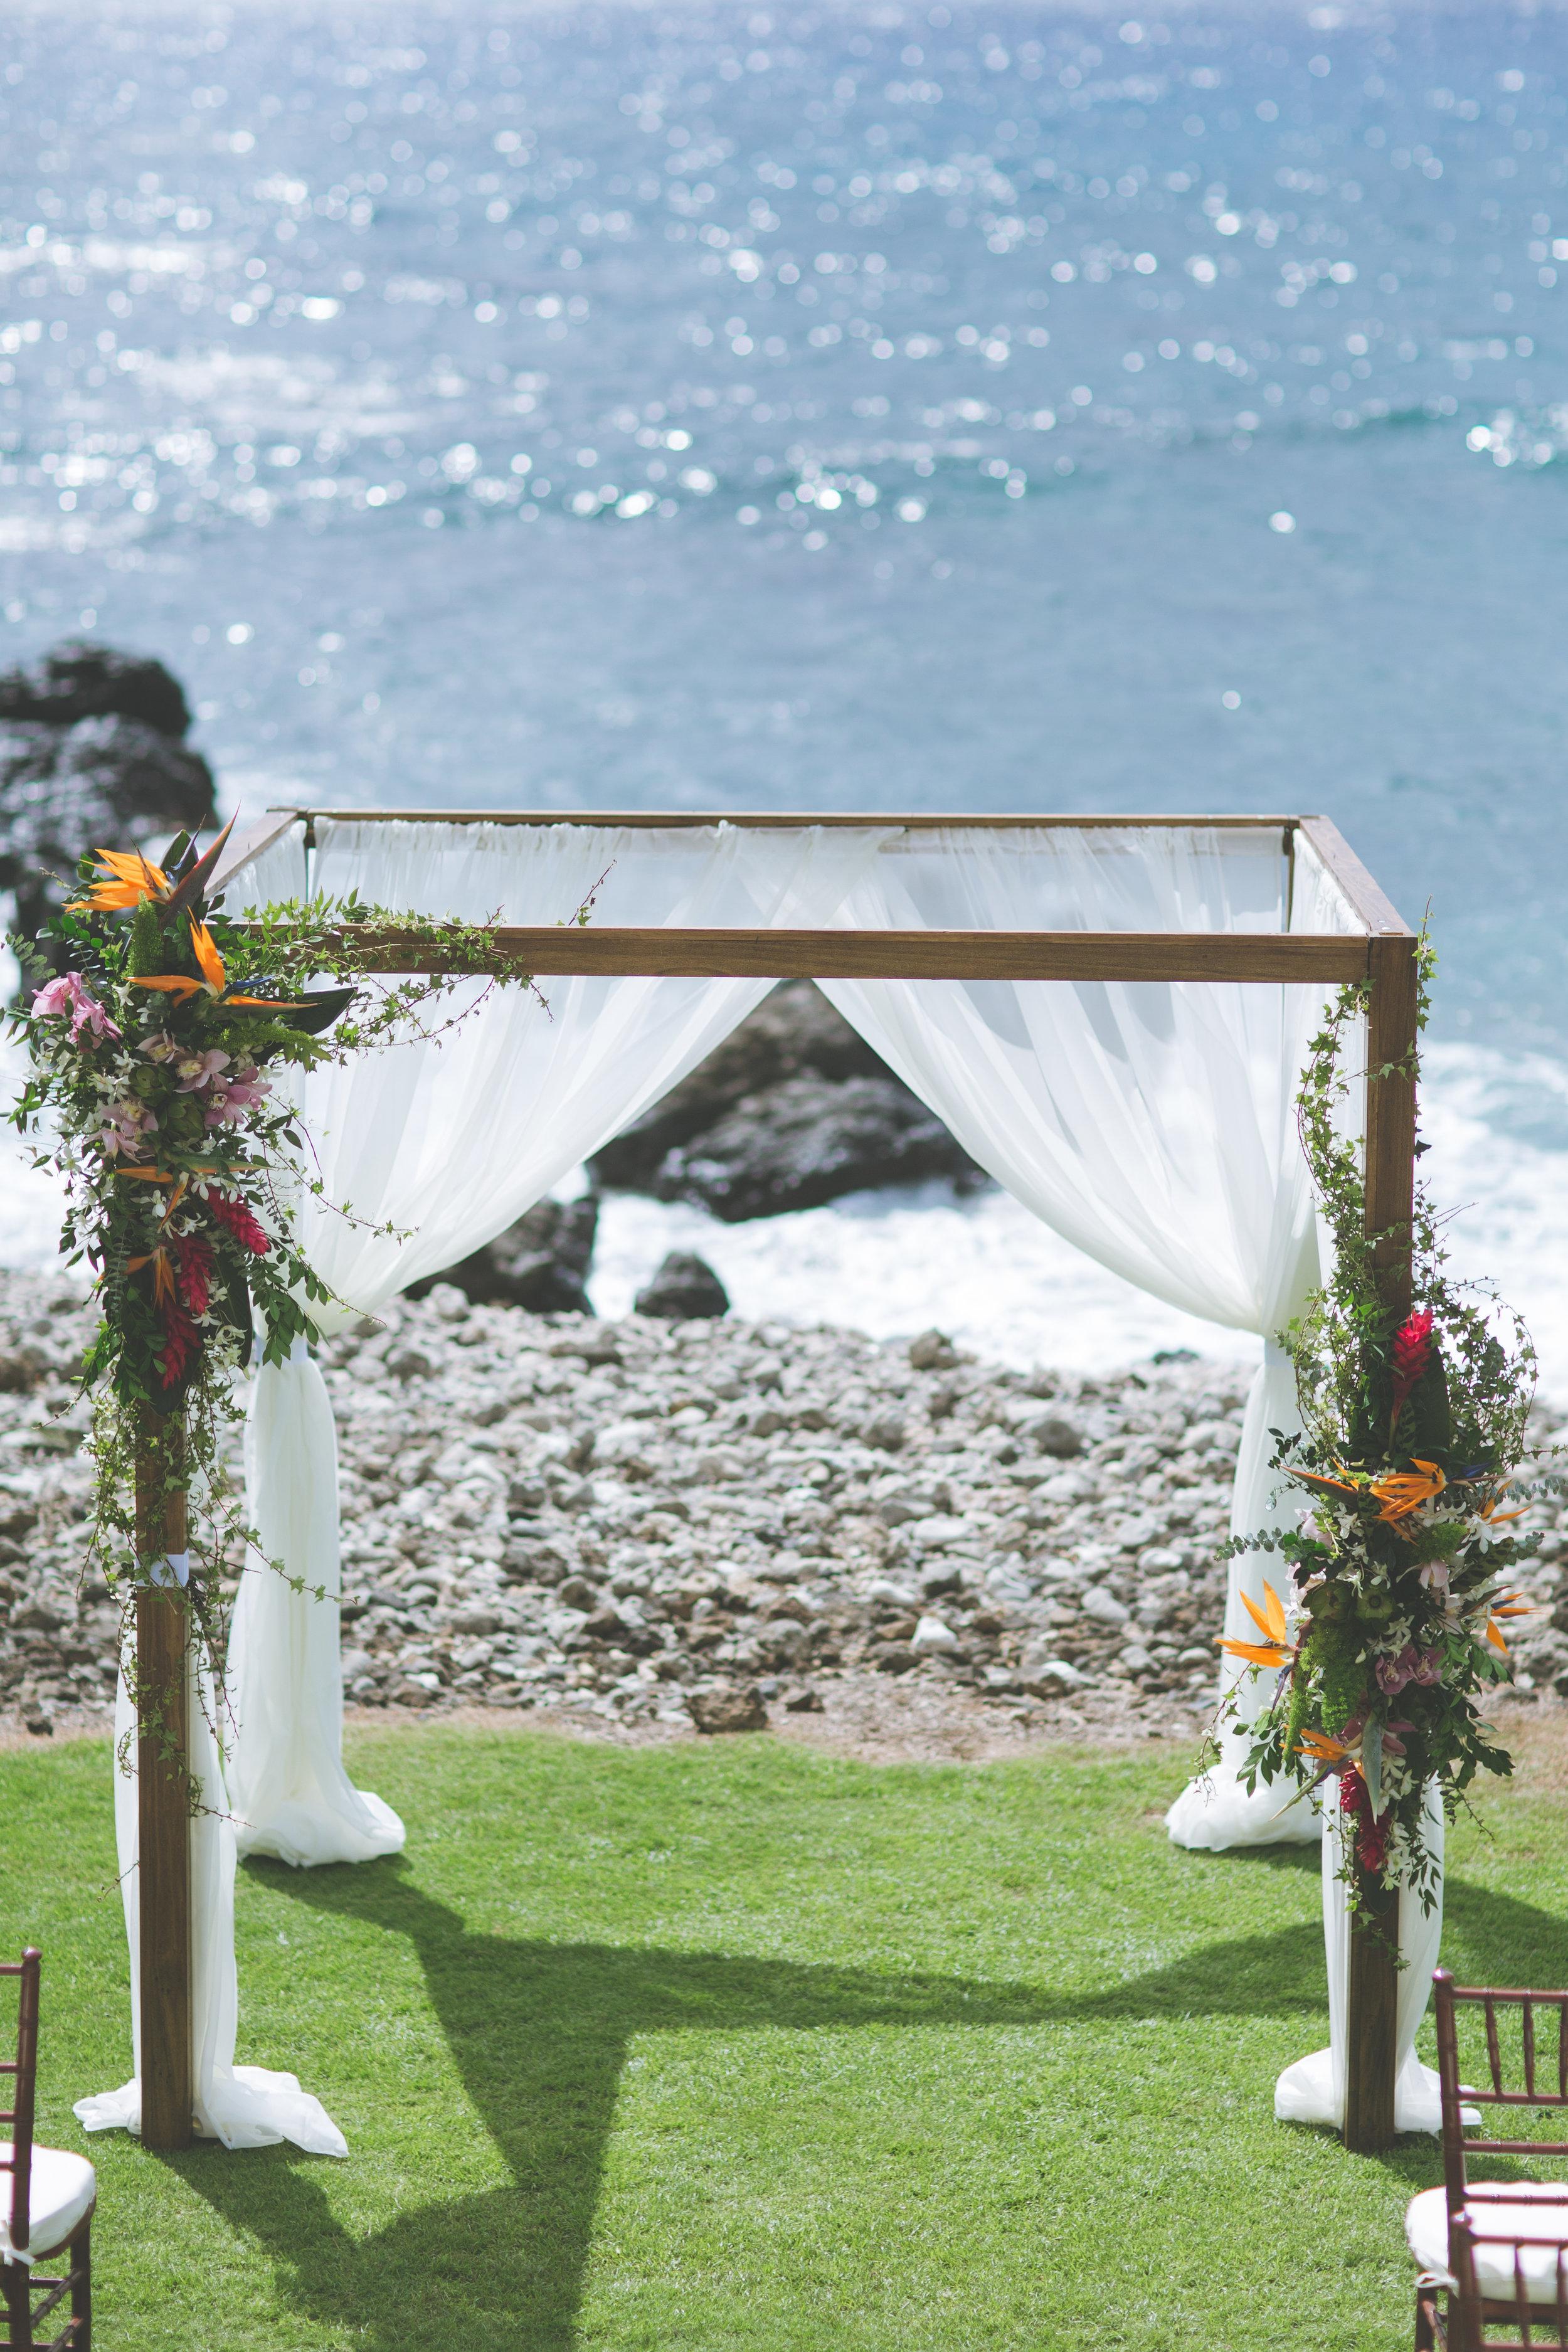 Bliss Maui Wedding - Dmitri and Sandra Photography - wedding arch